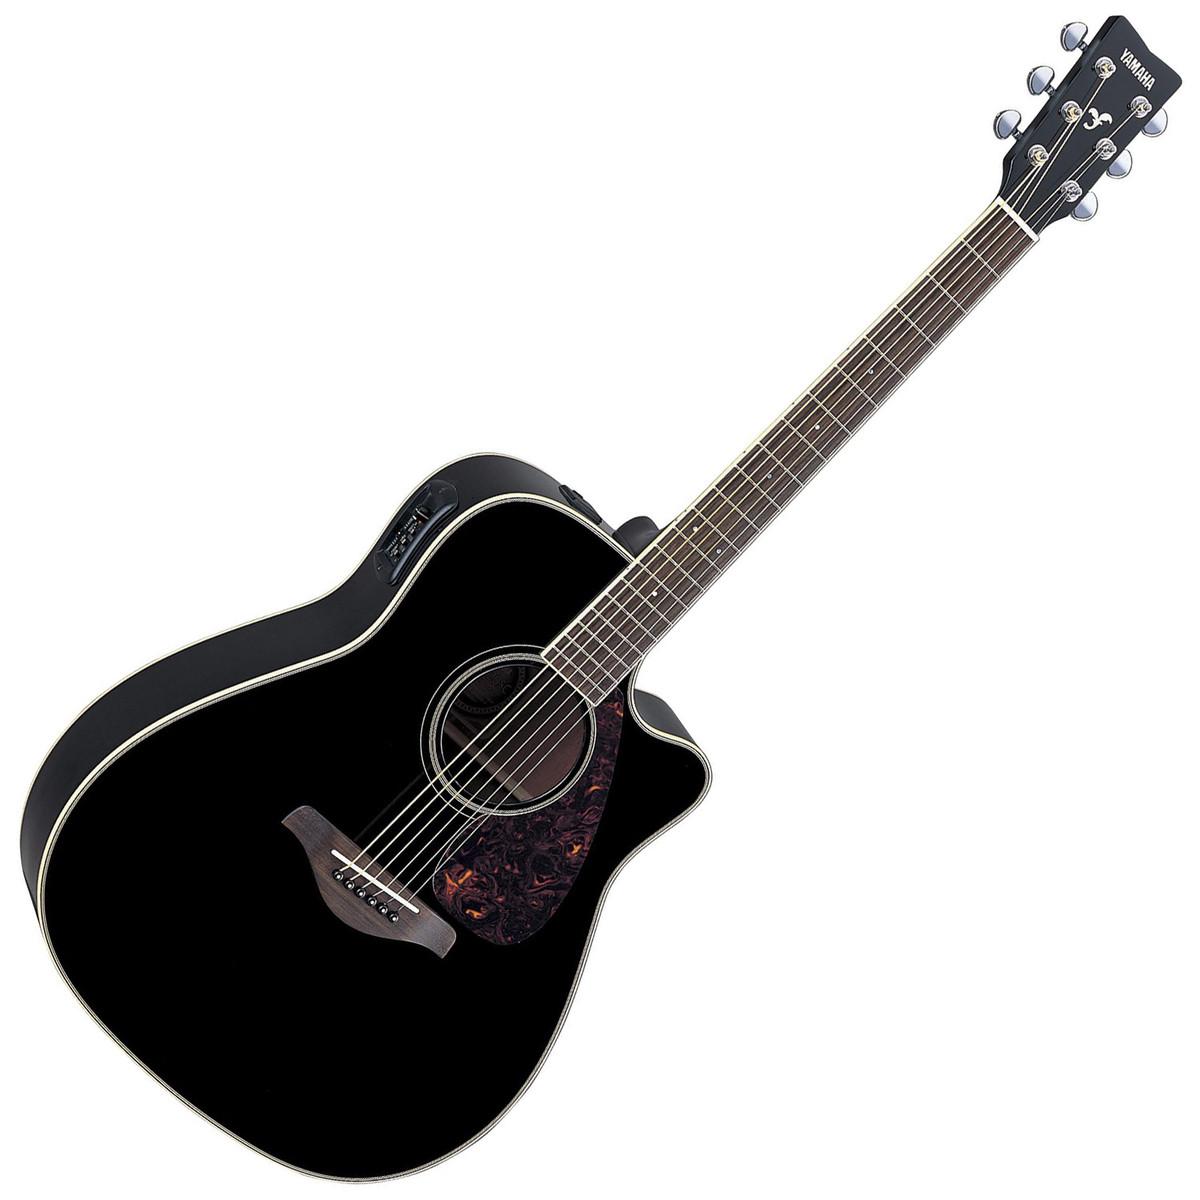 yamaha fgx720sca guitare electro acoustique noire housse offerte. Black Bedroom Furniture Sets. Home Design Ideas